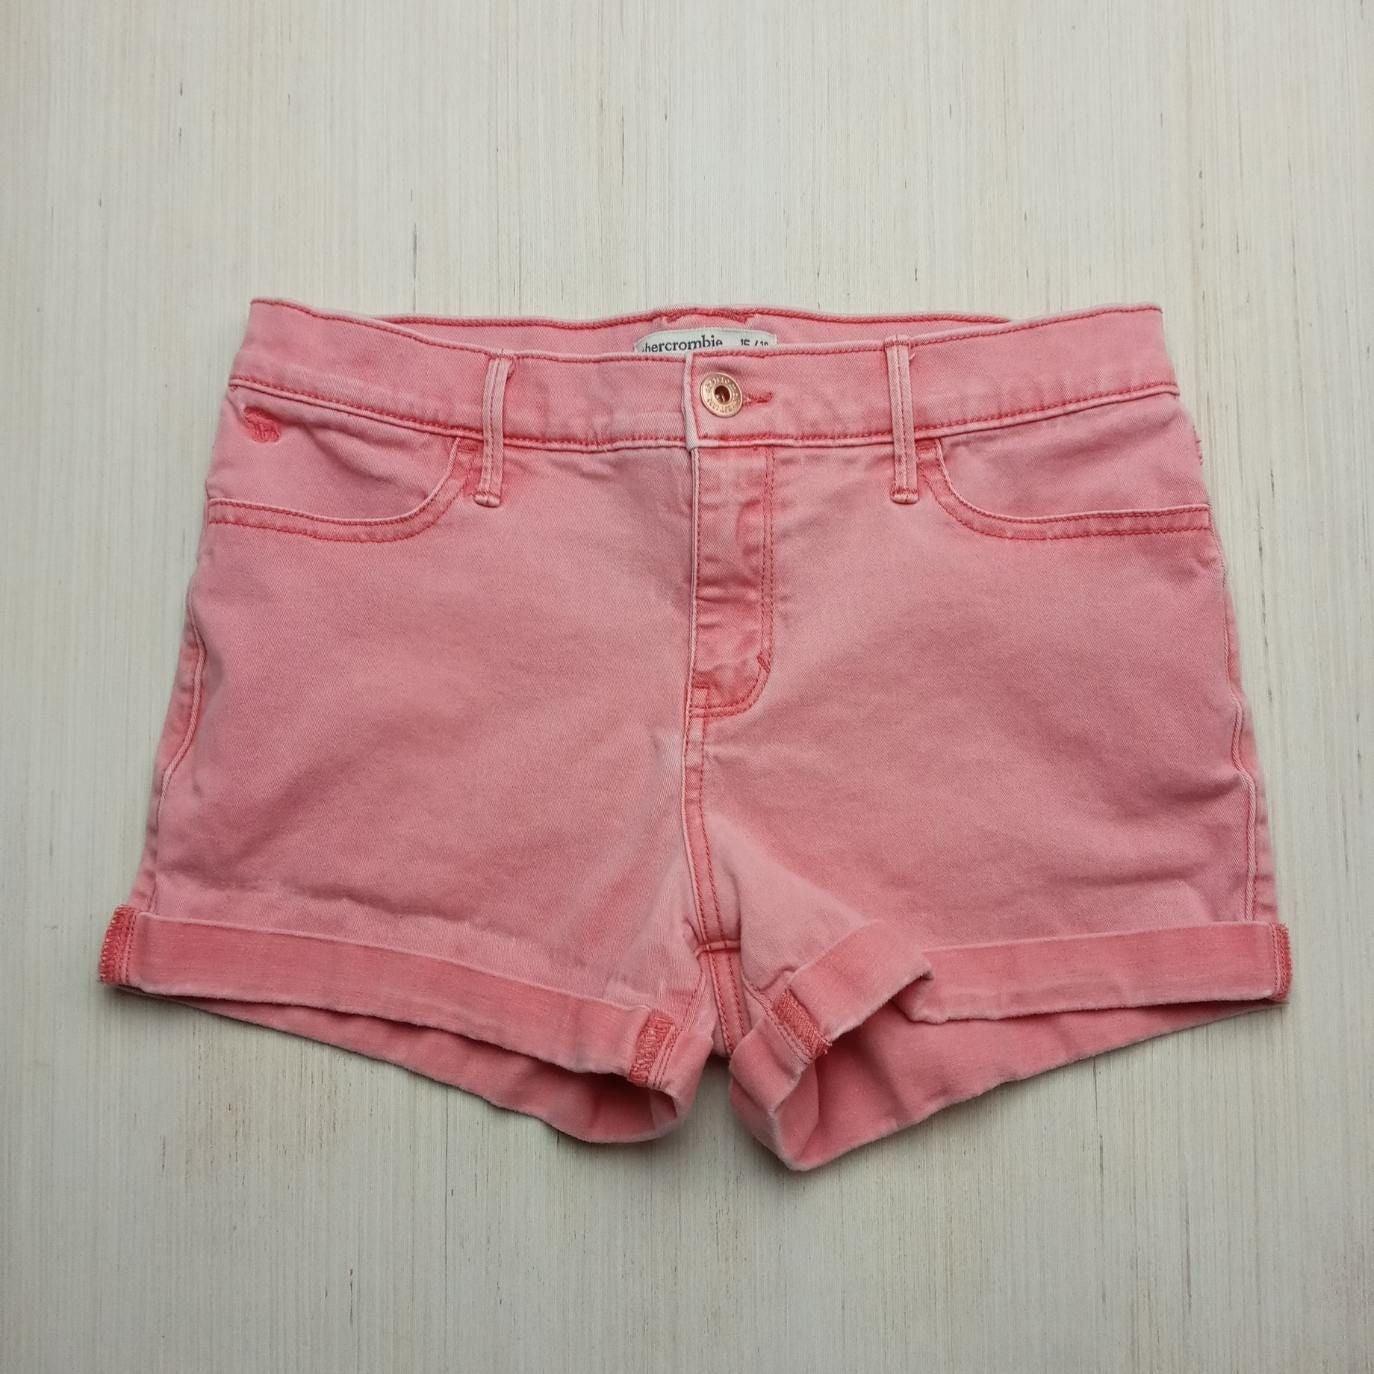 abercrombie kids Girls size 15/16 shorts